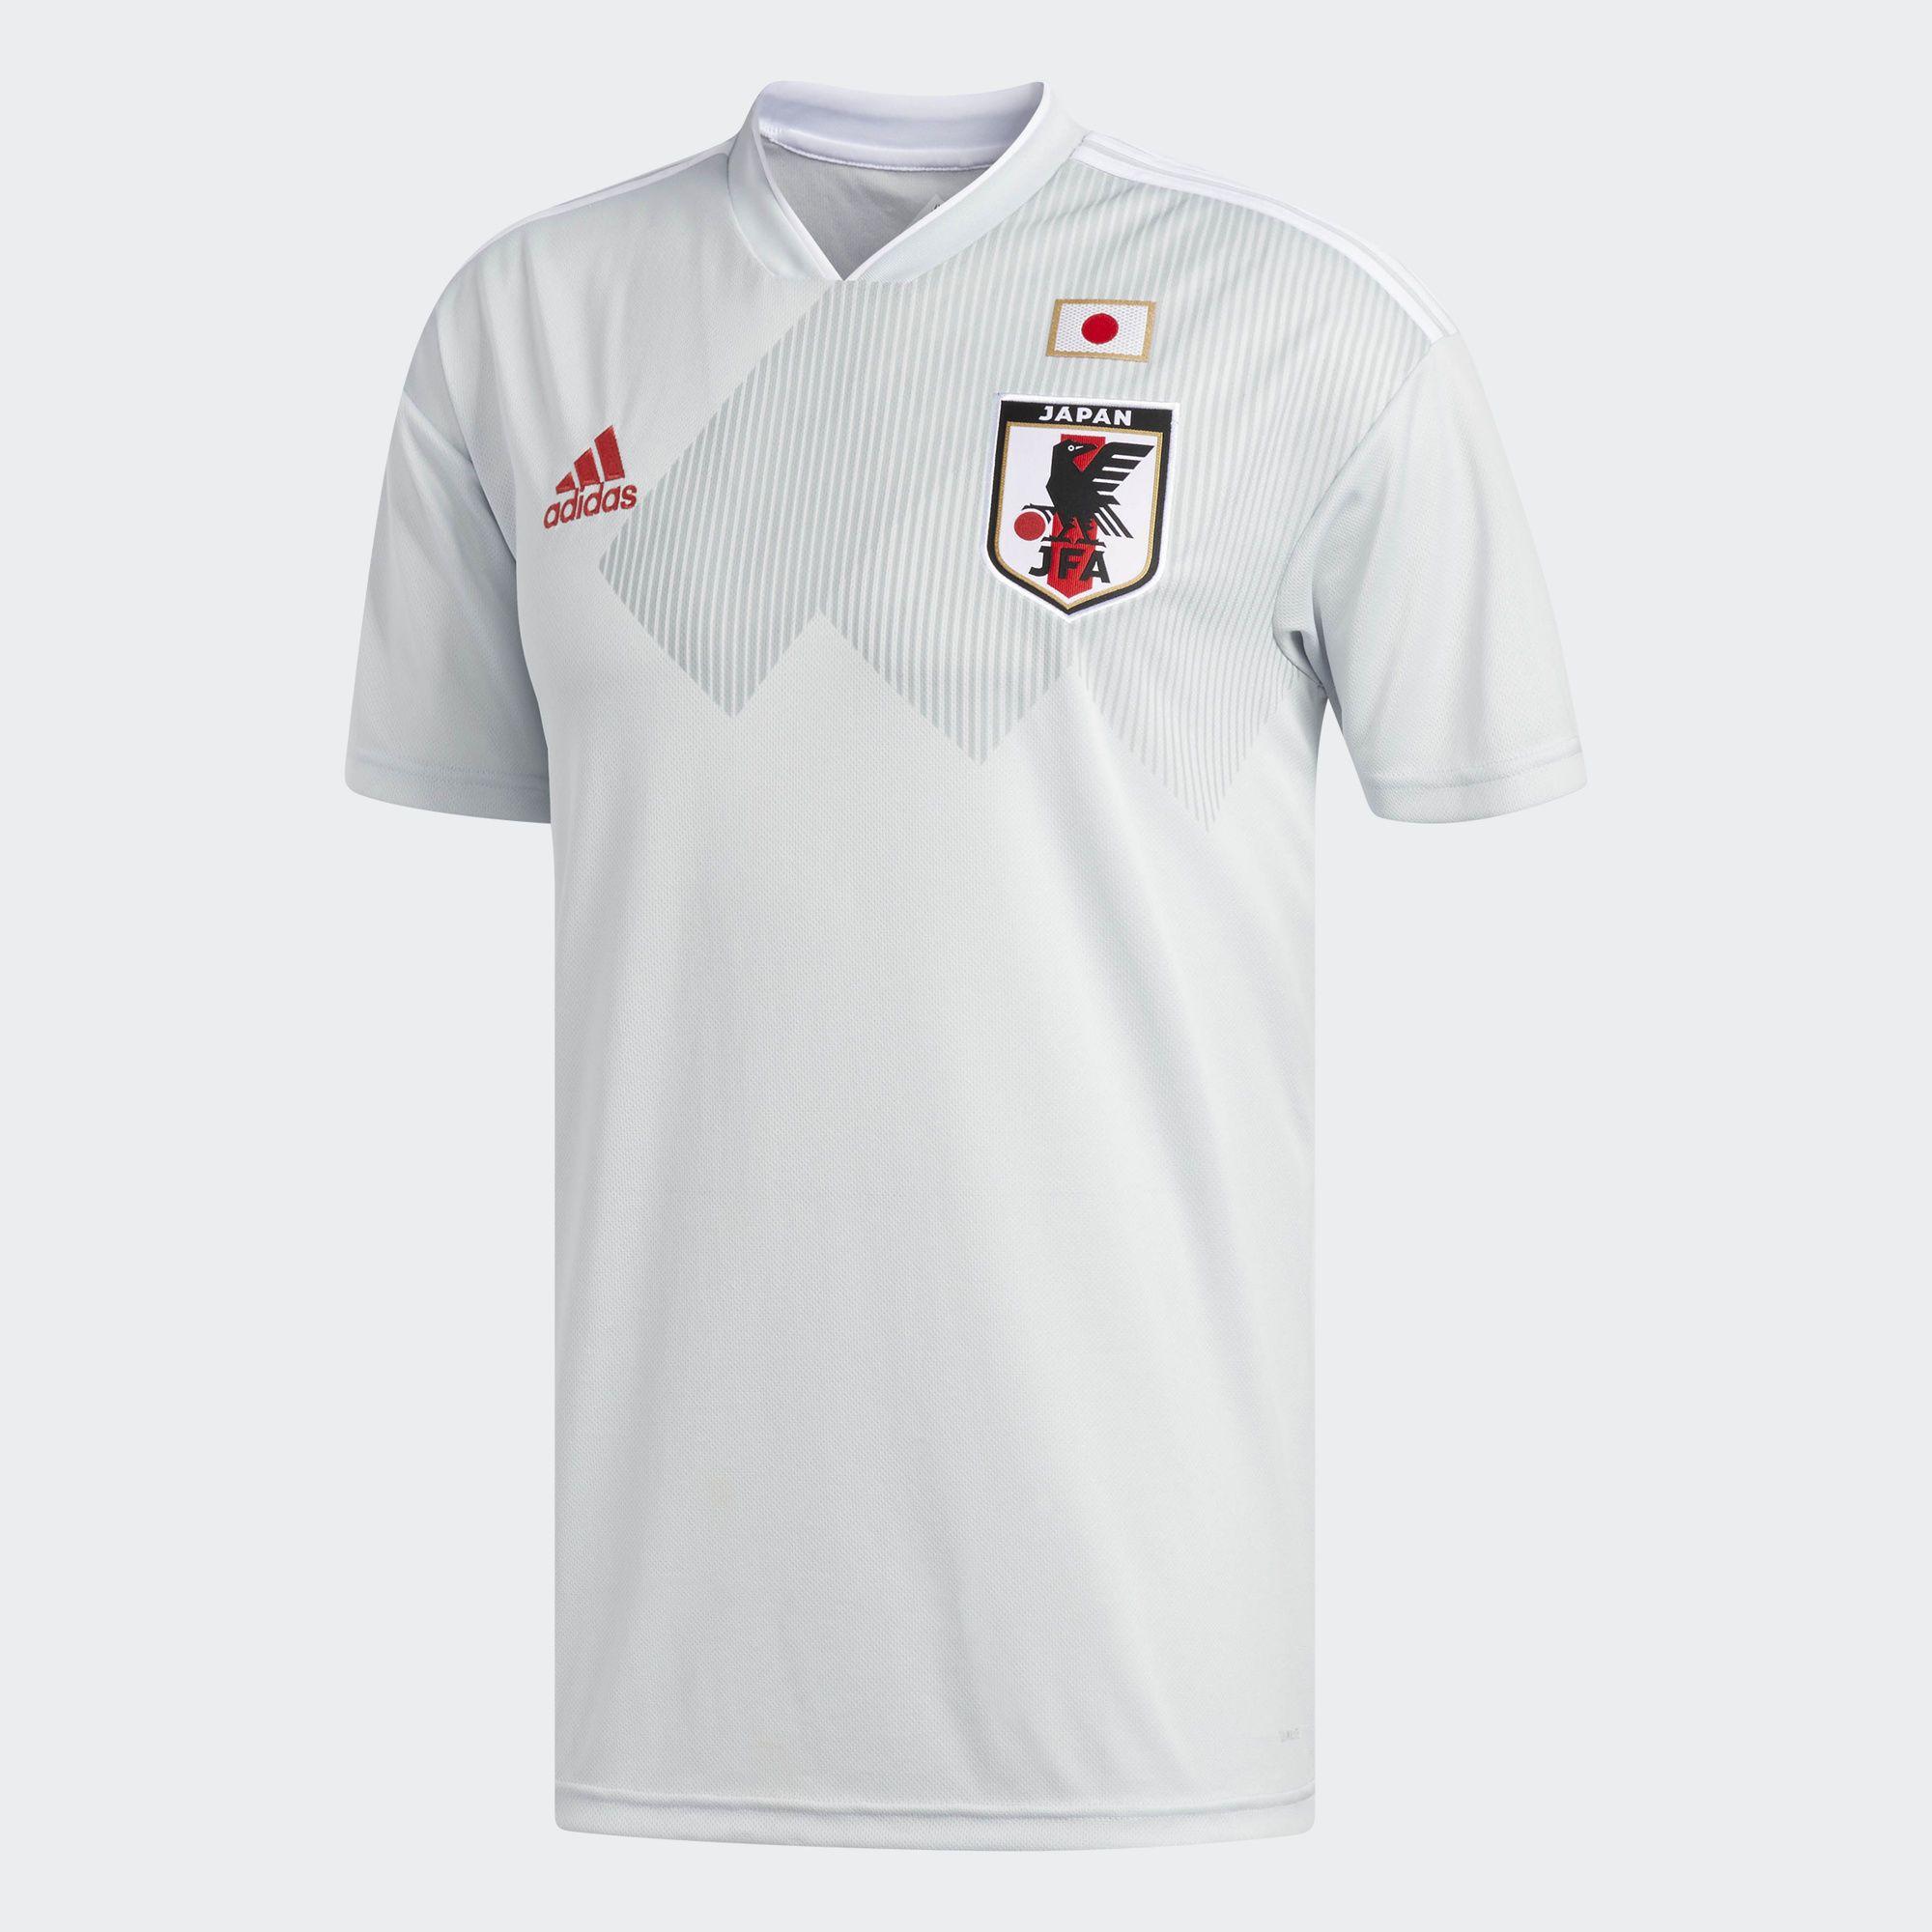 Adidas Replica Da Camisola Alternativa Do Japao Clear Grey White Br3627 Wholesale Shirts Shirts Grey Shirt